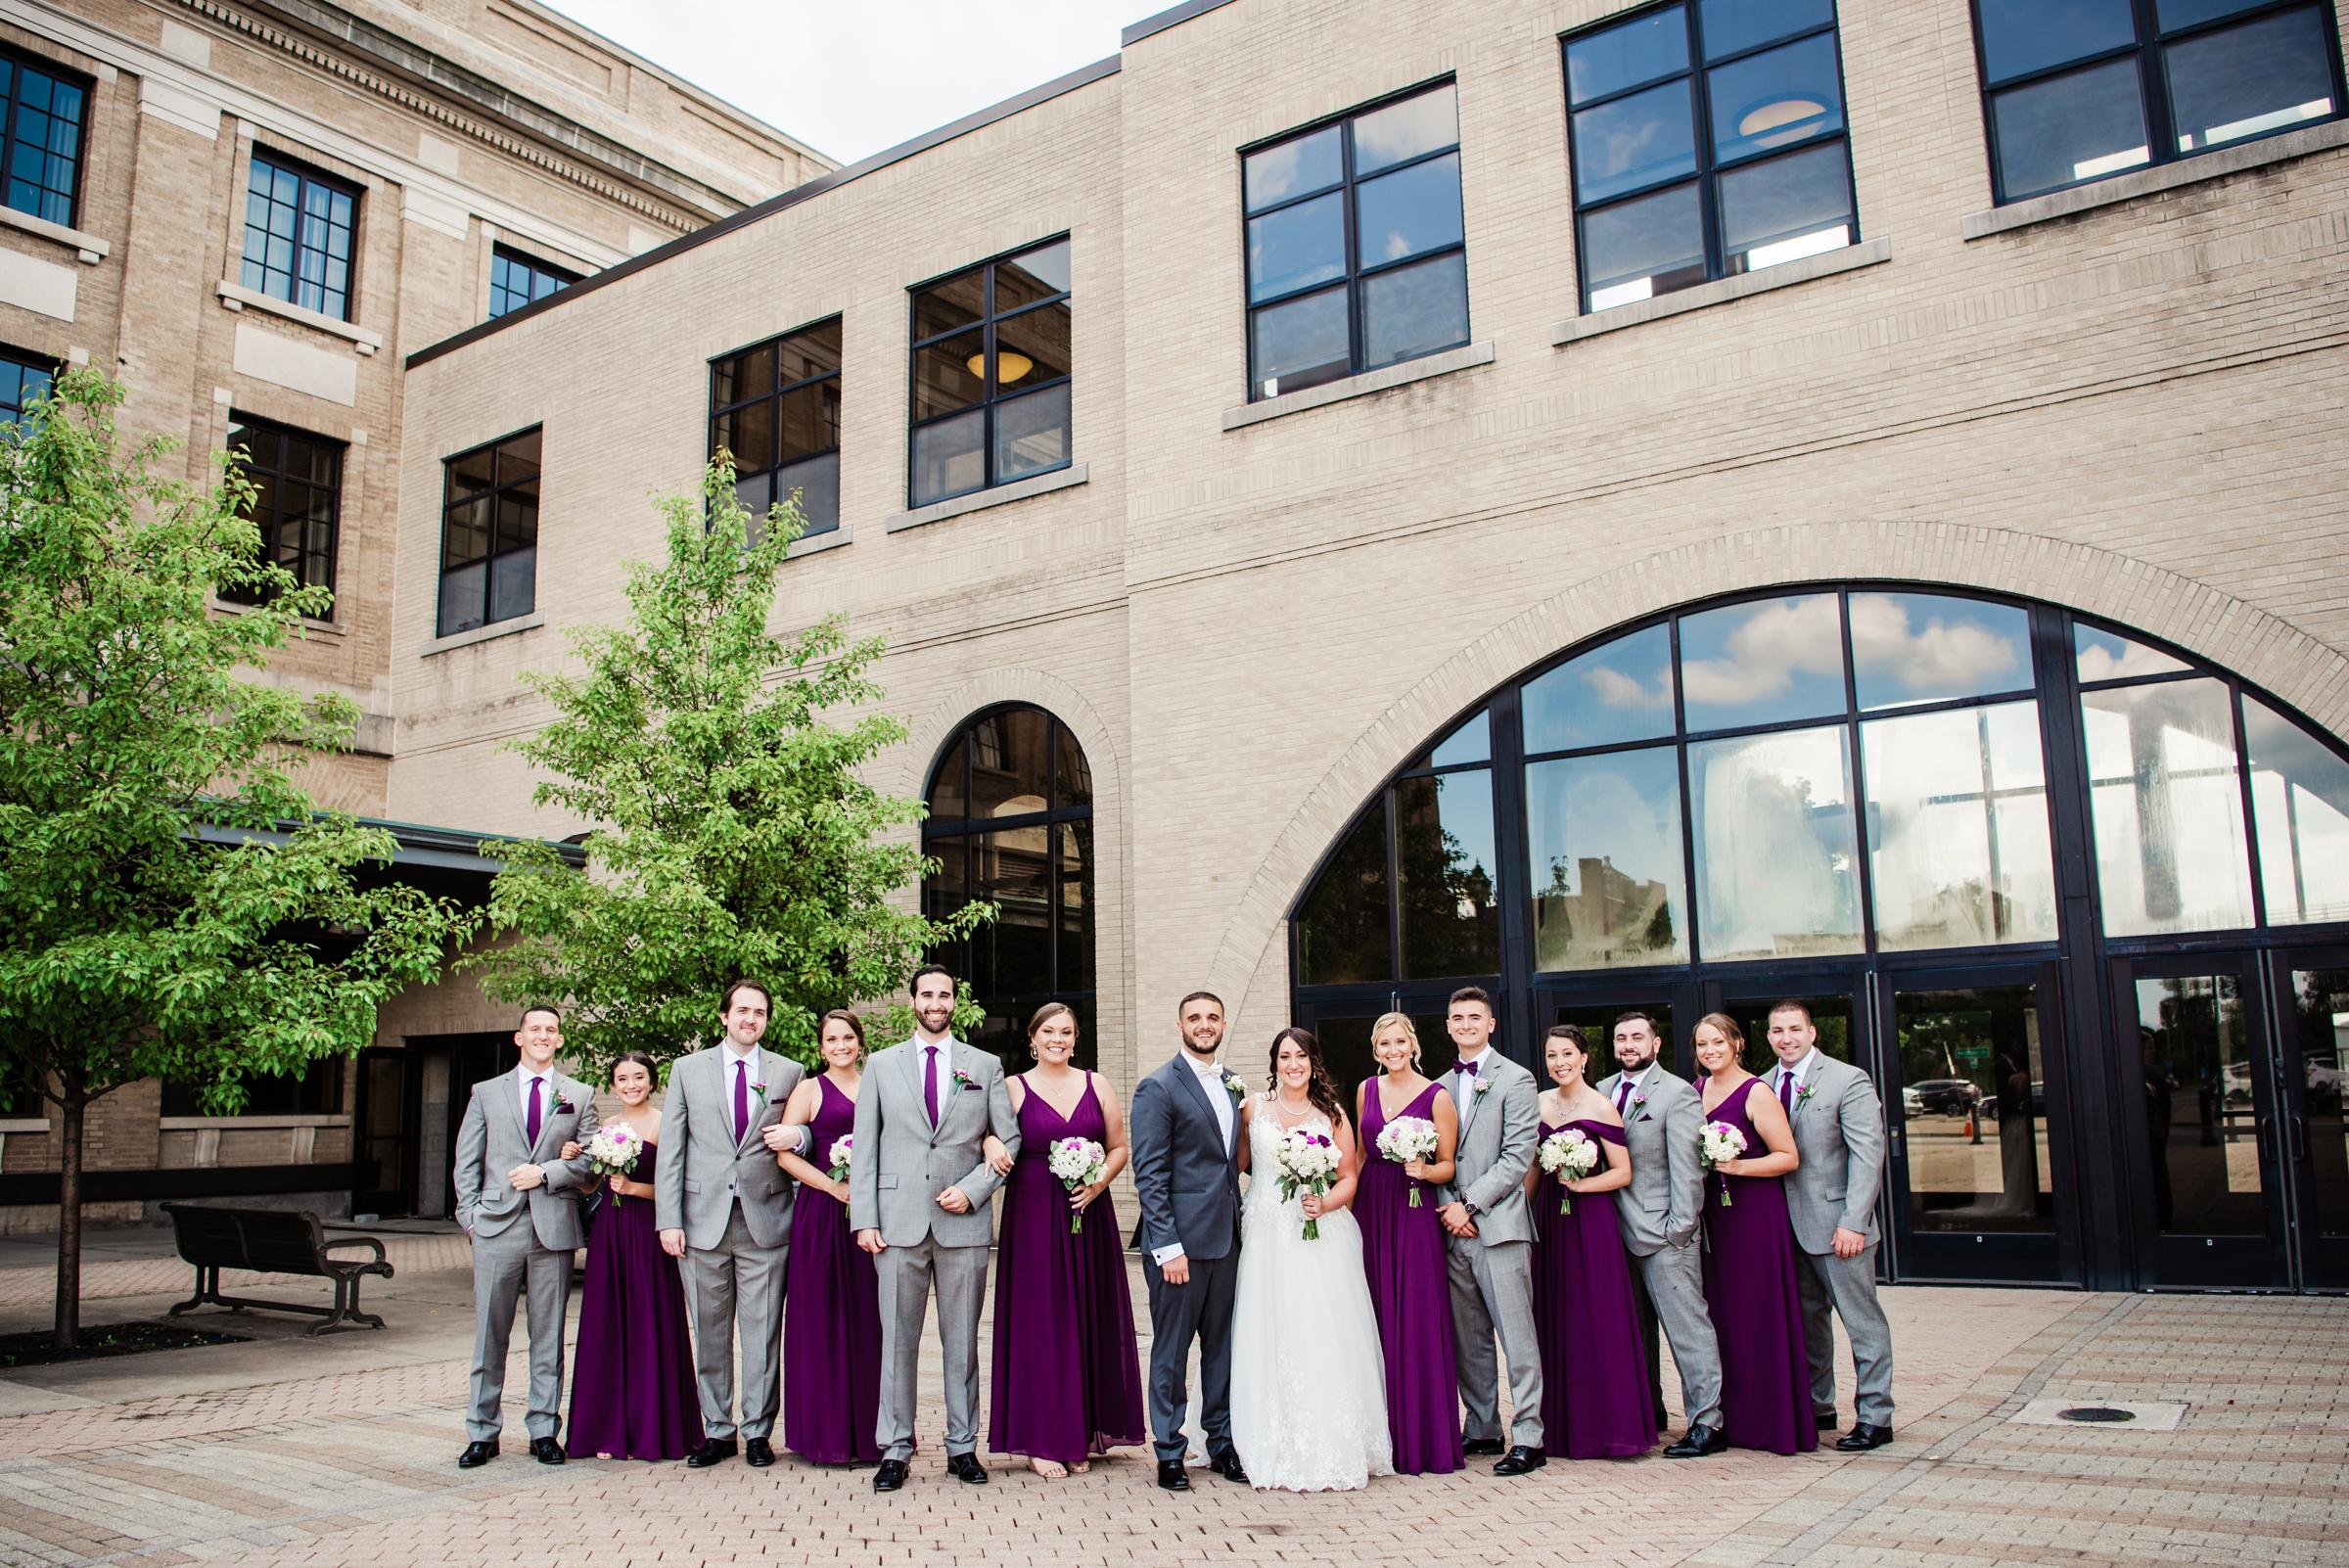 Historic_Old_St_Johns_Church_Valentinos_Banquet_Hall_Central_NY_Wedding_JILL_STUDIO_Rochester_NY_Photographer_DSC_6289.jpg